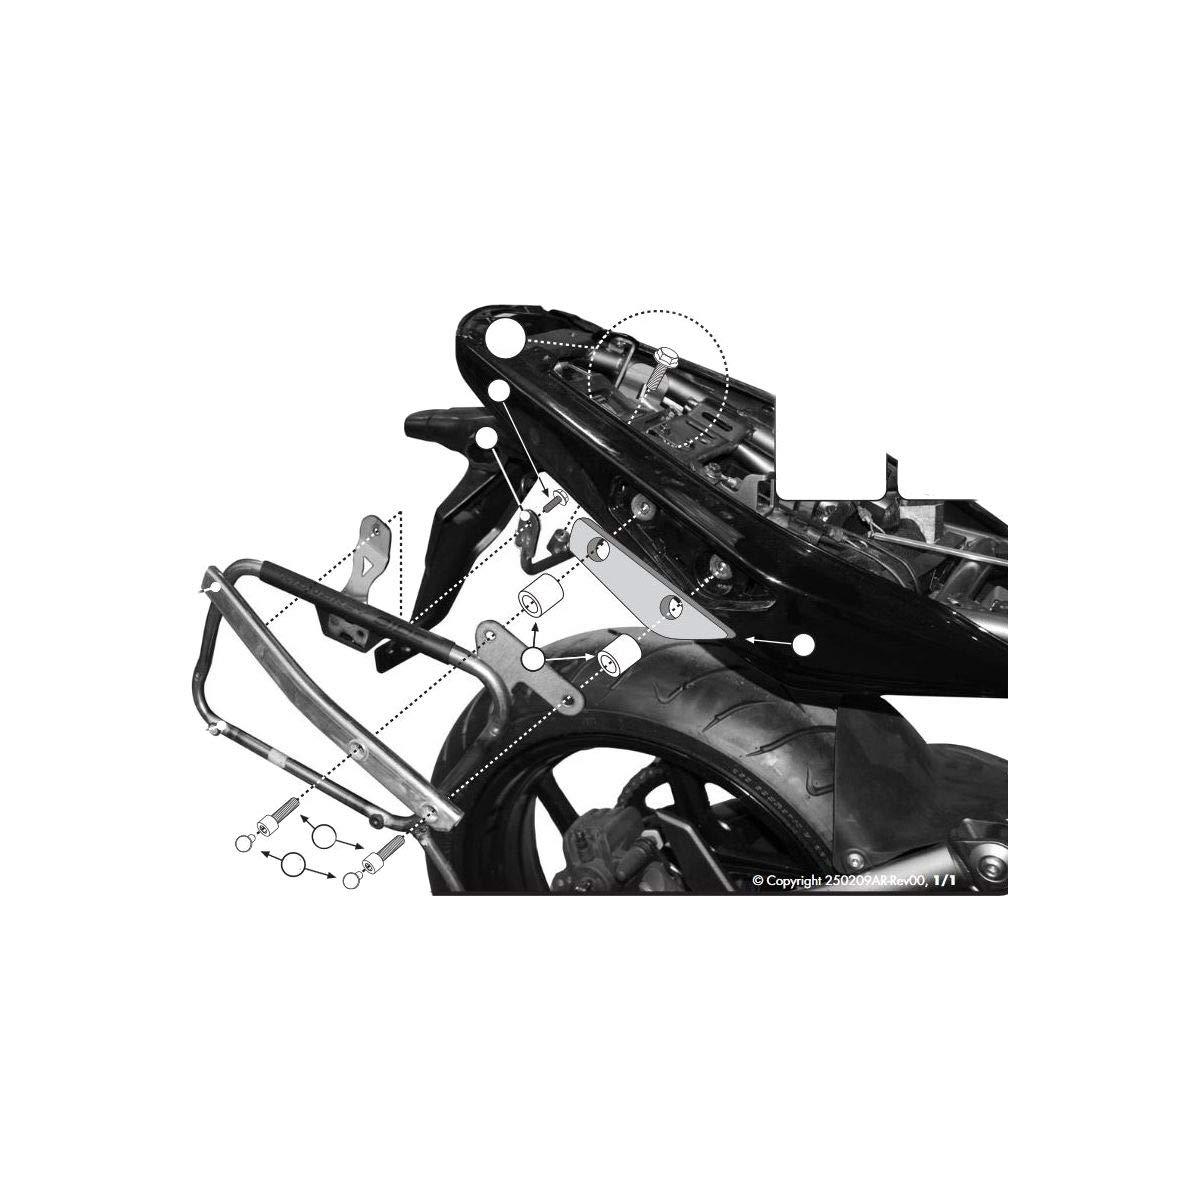 GIVI Side Case Mount Brackets for 09-11 Kawasaki EX650